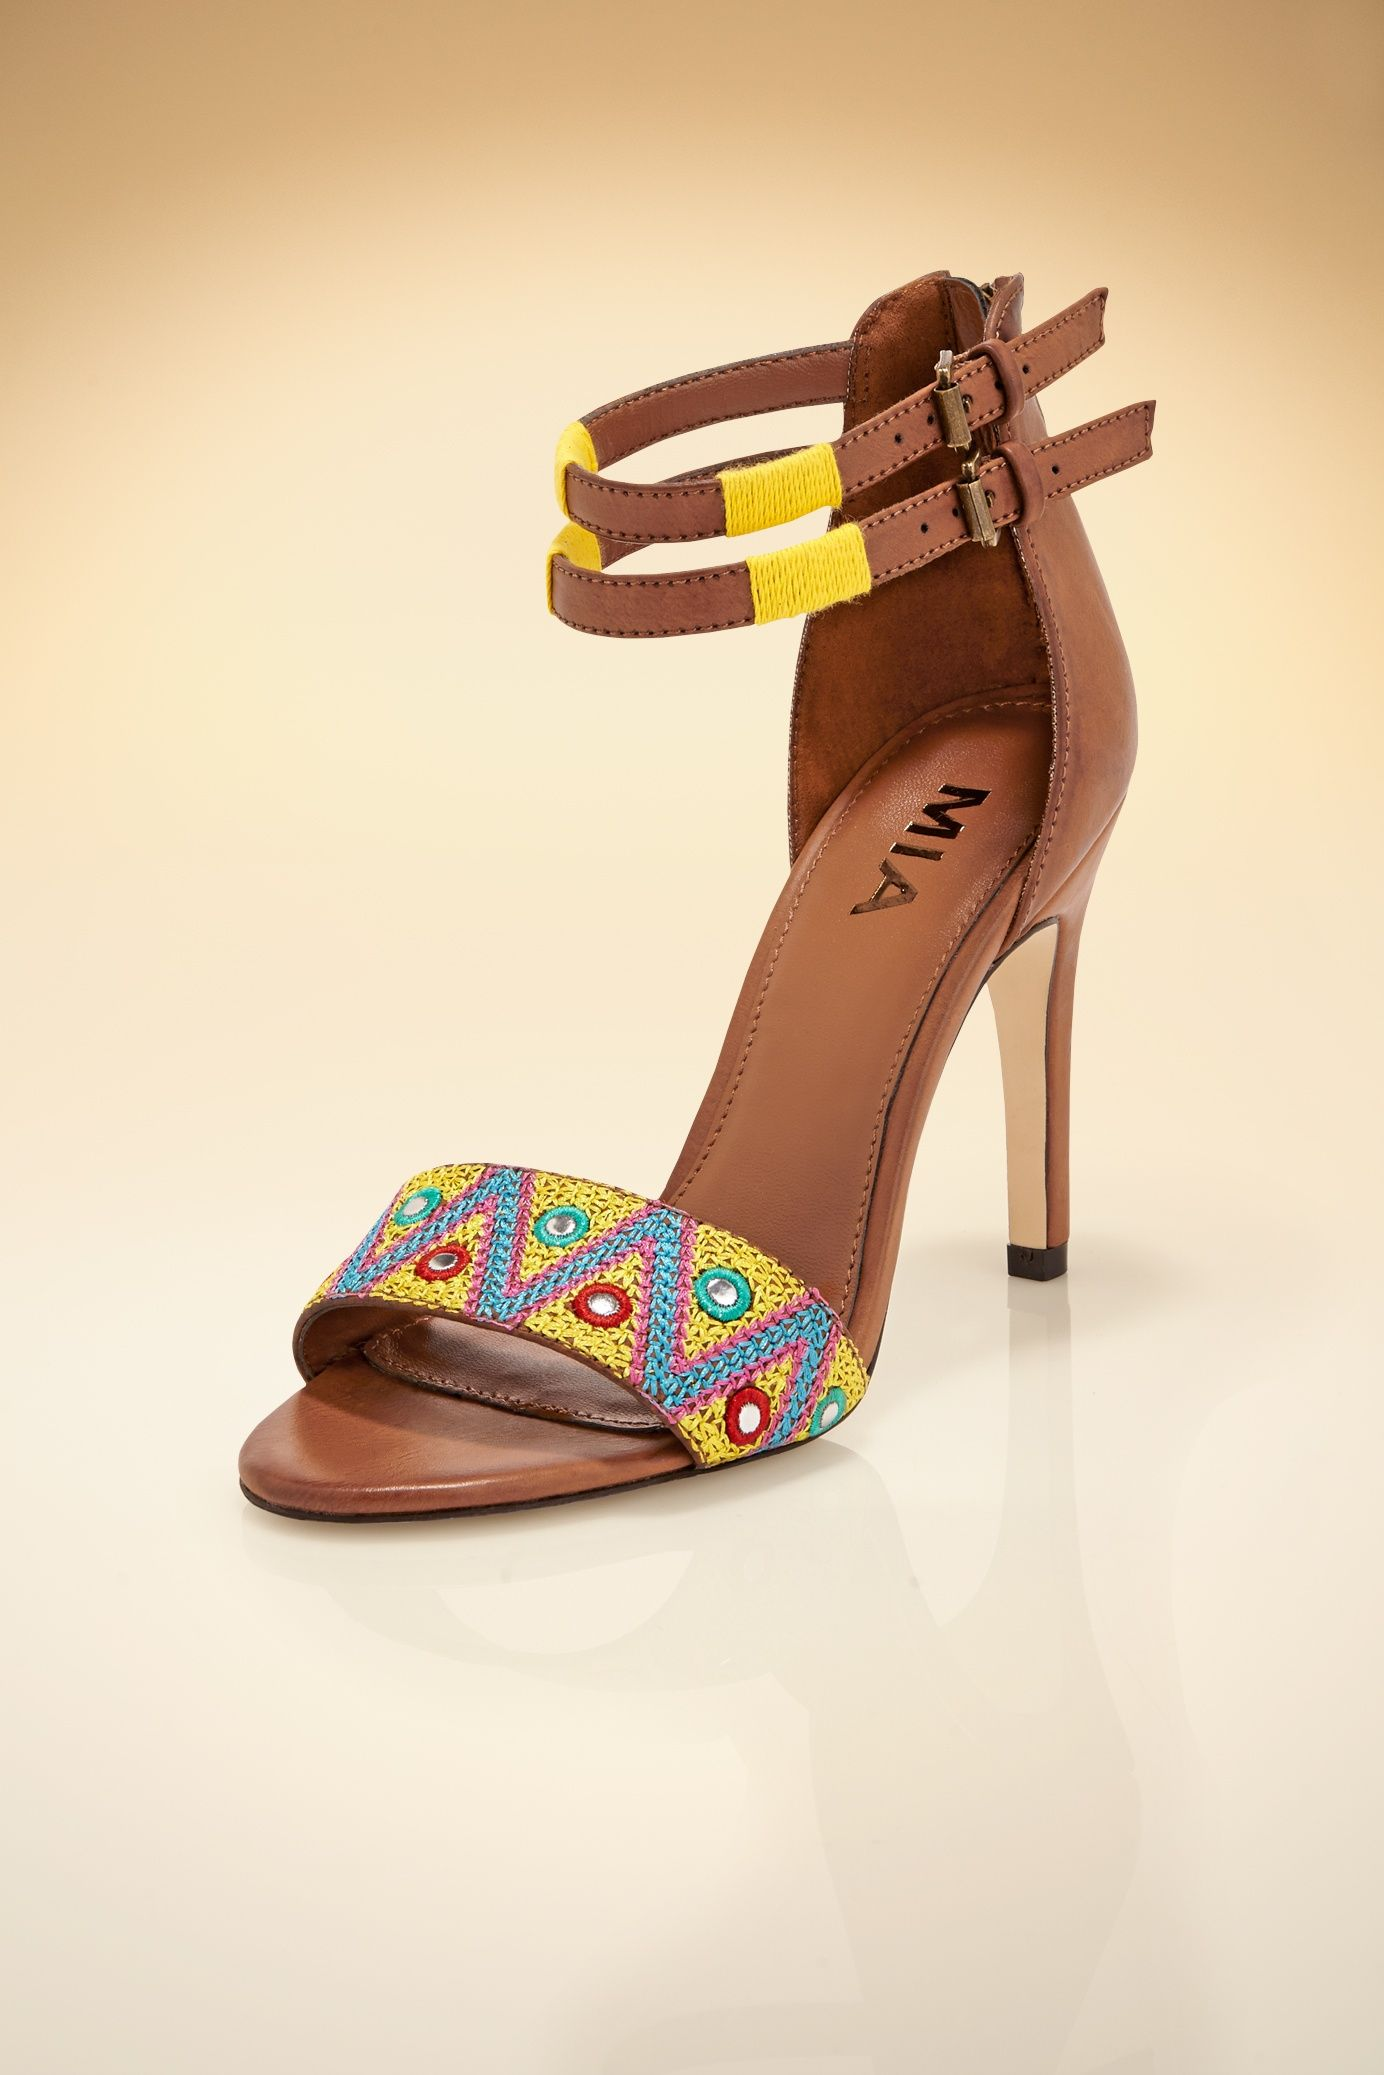 Sexy colorful heel - Boston Proper